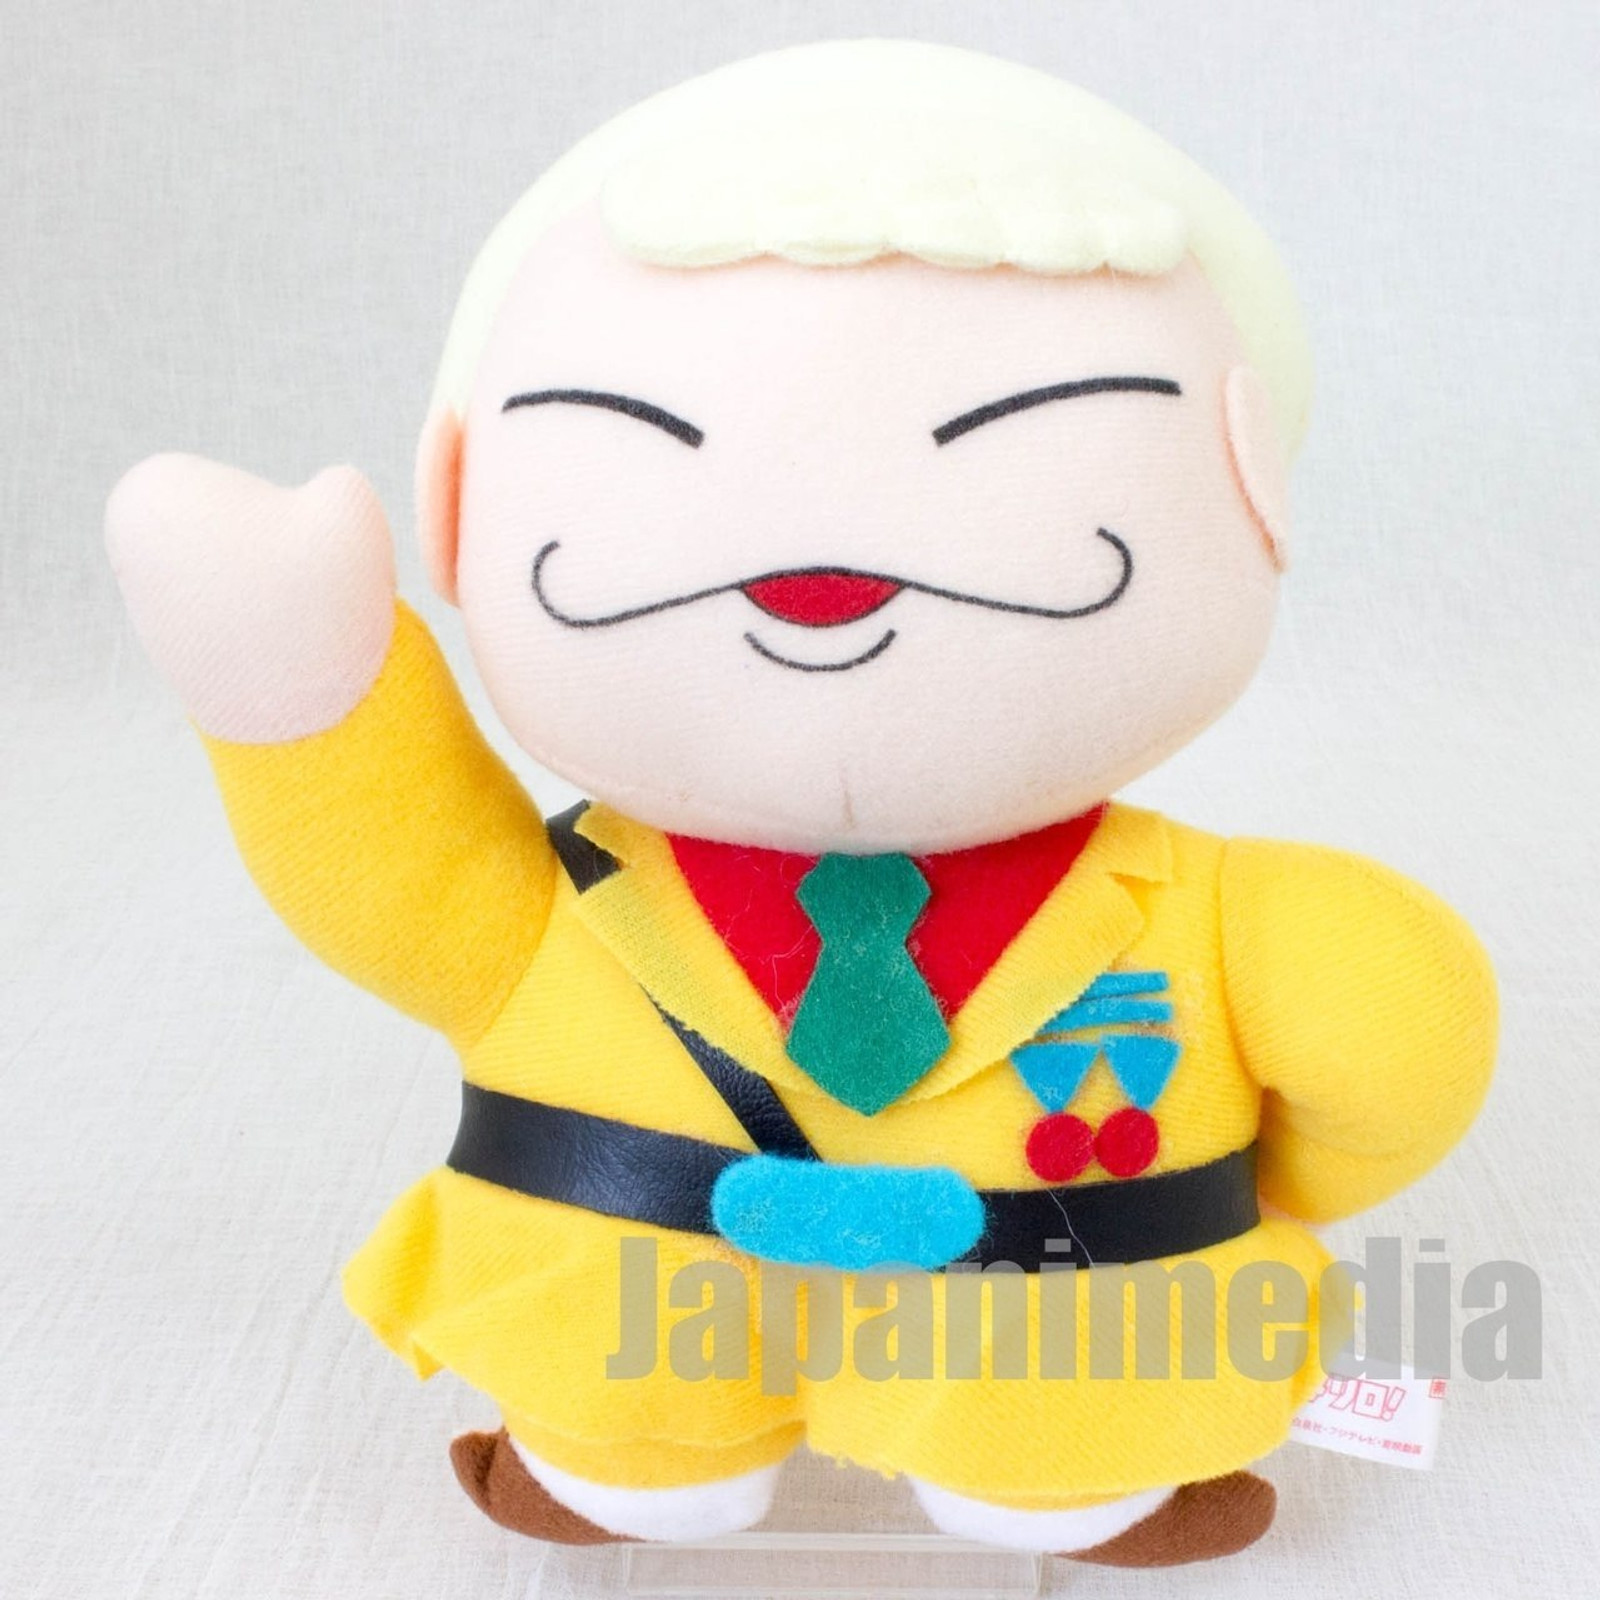 Retro Rare! Patalliro Plush Doll Yujin 2 JAPAN ANIME MANGA 3